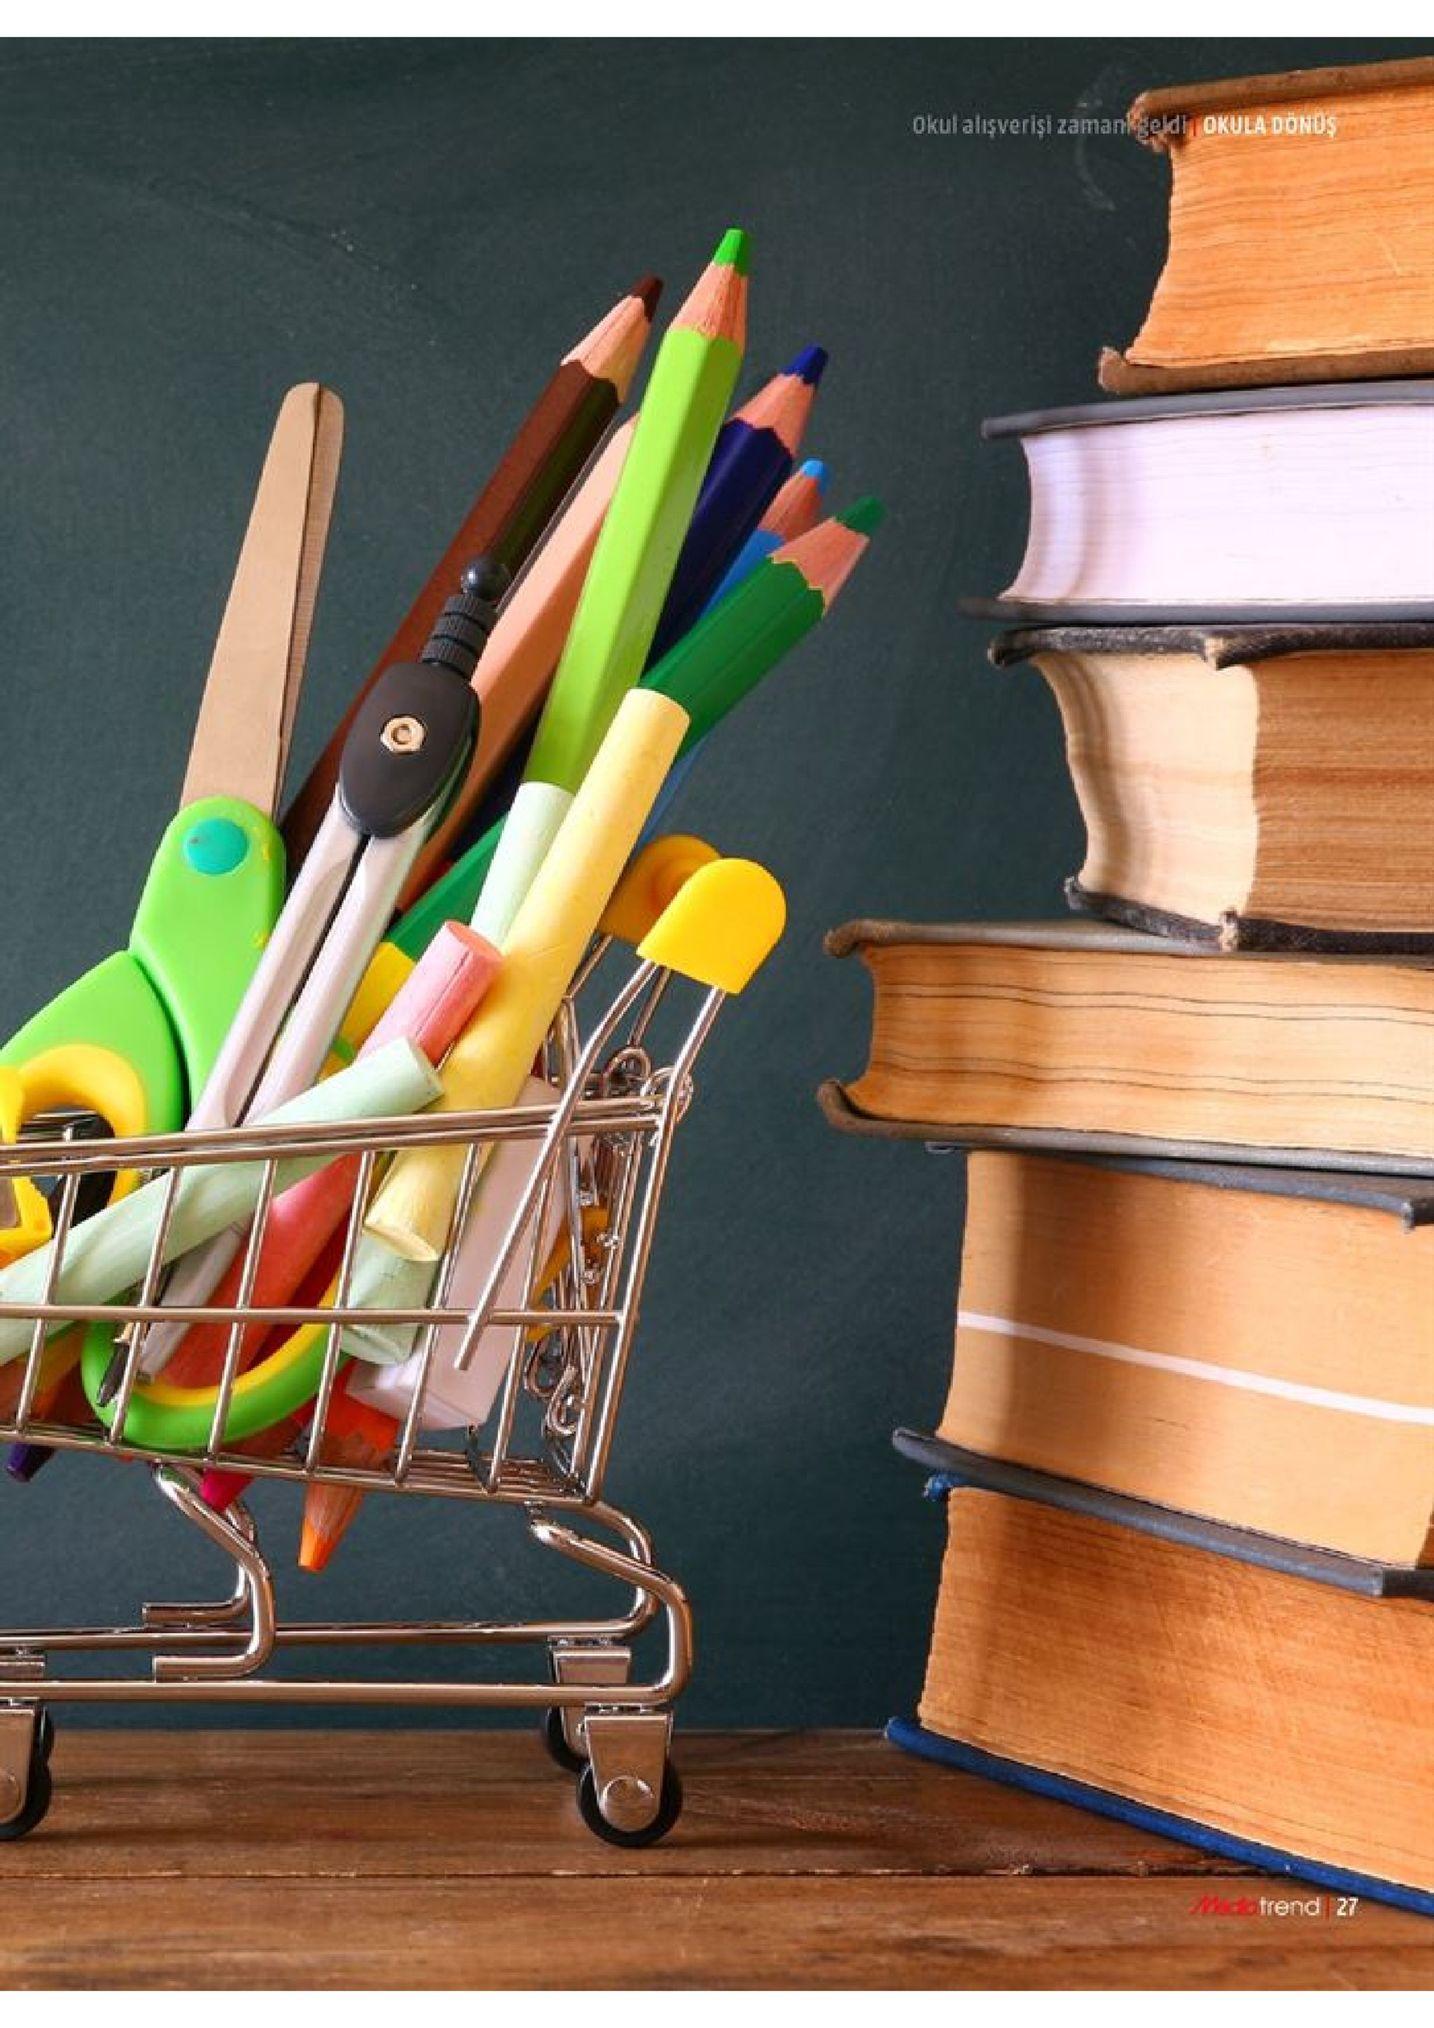 okul alişverişi zamankgeldi okula donos idotrend 27